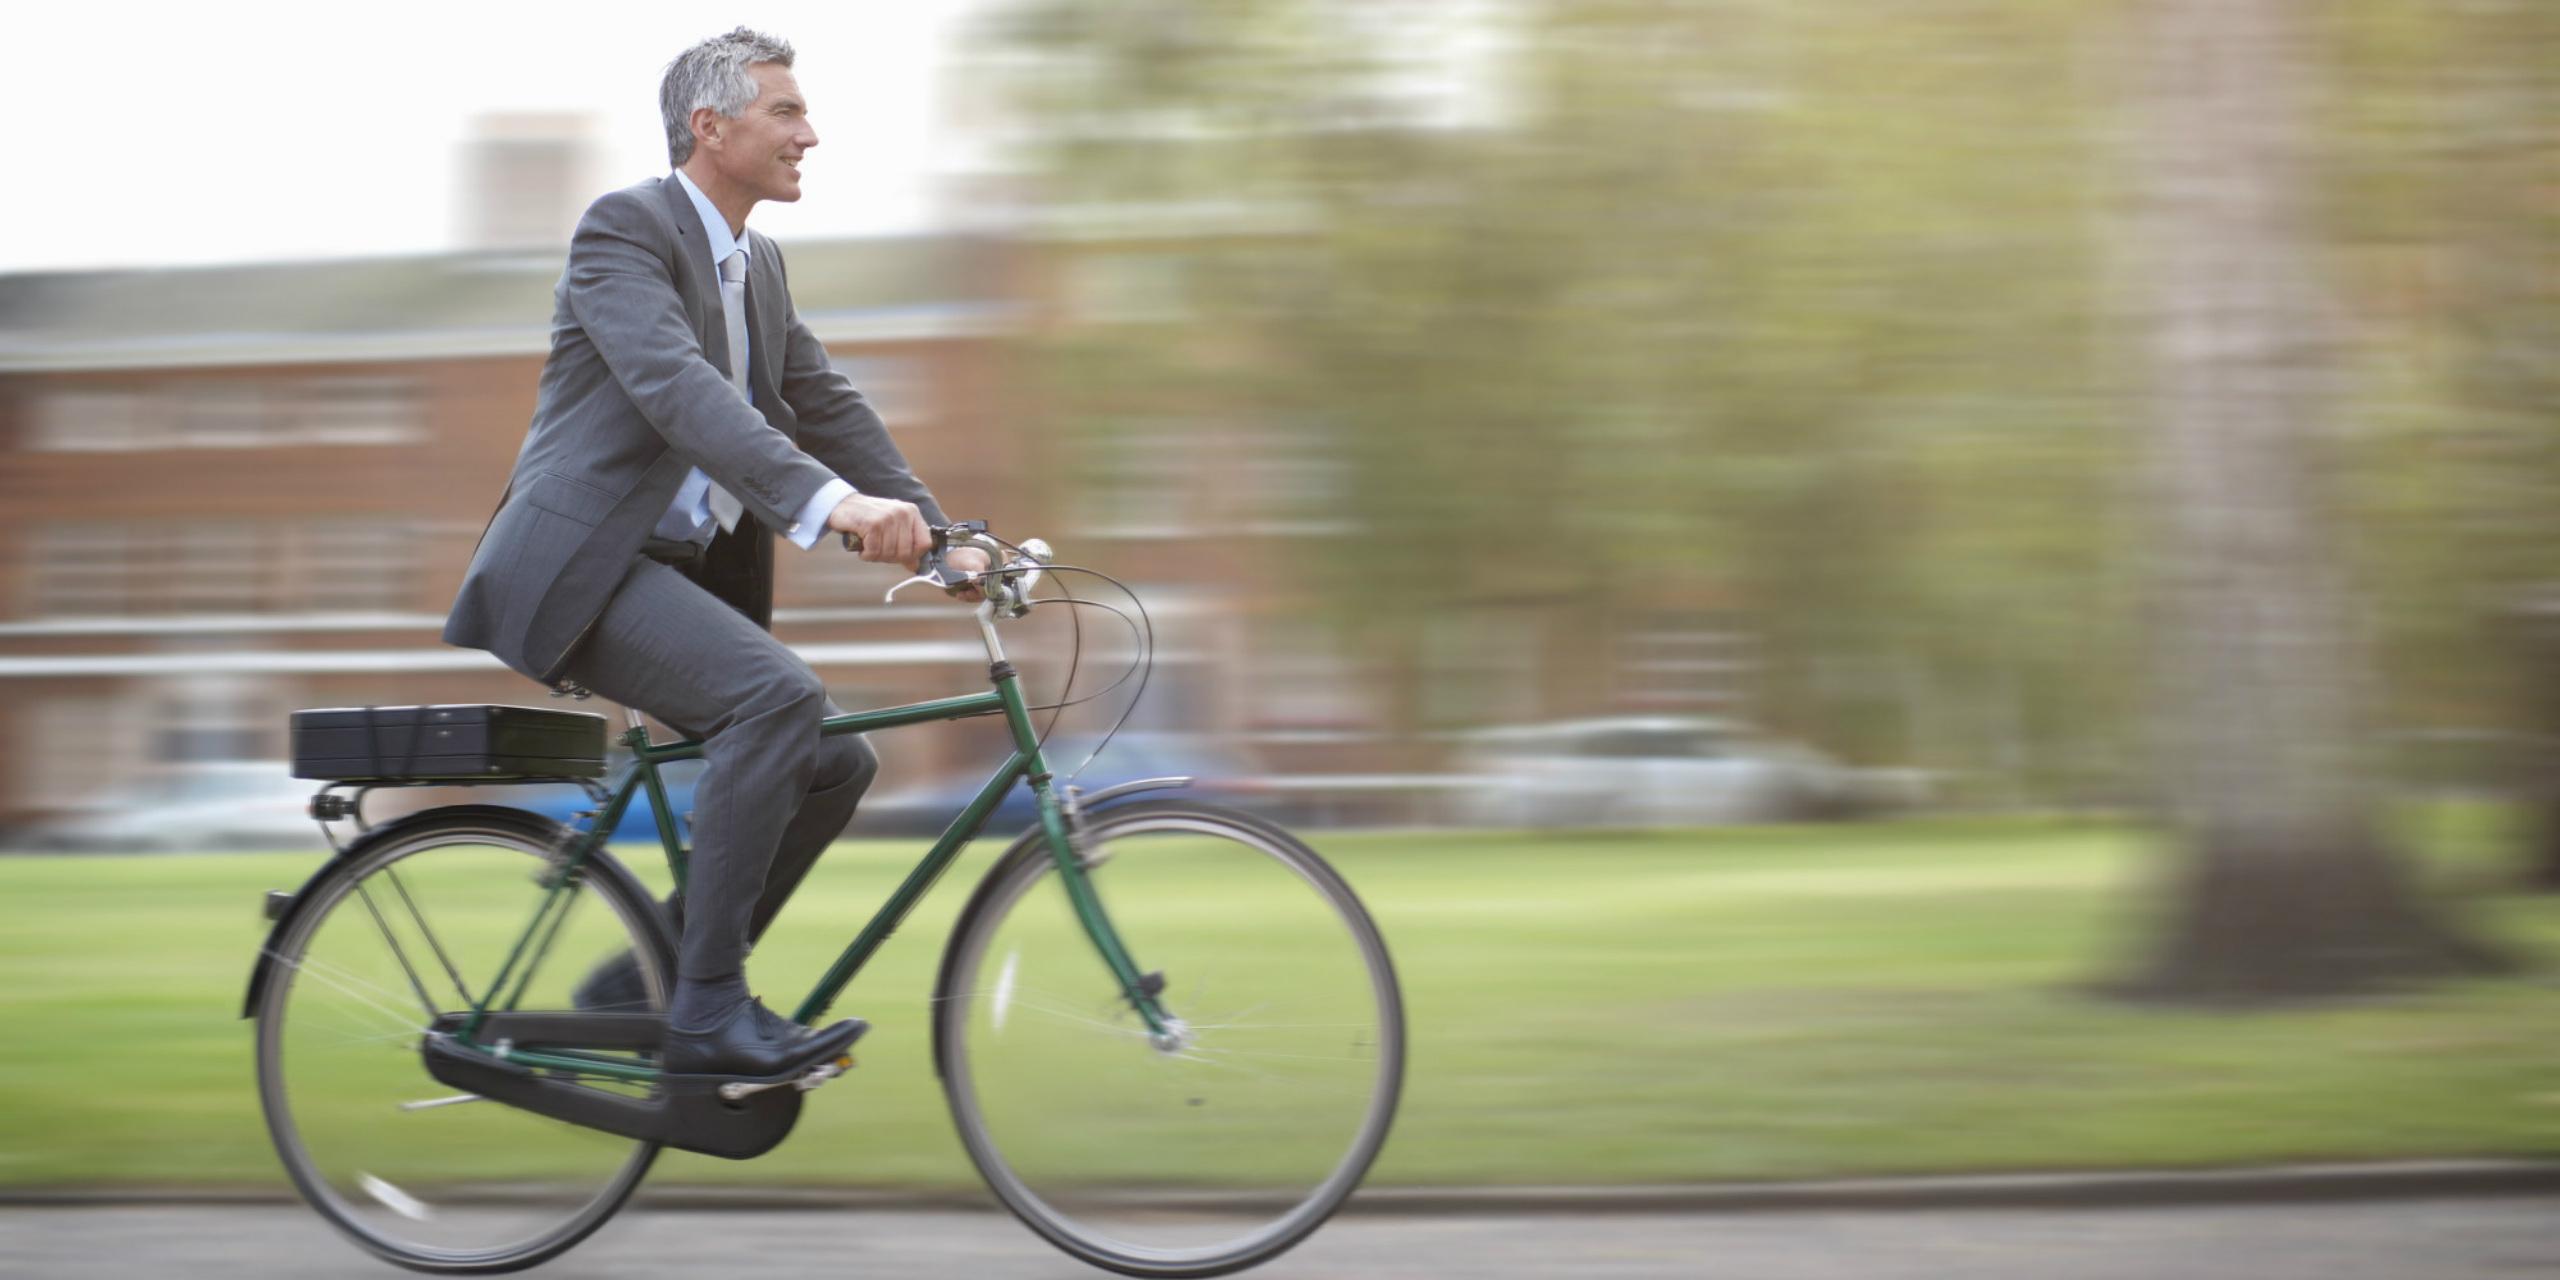 Lavoro-in-bici